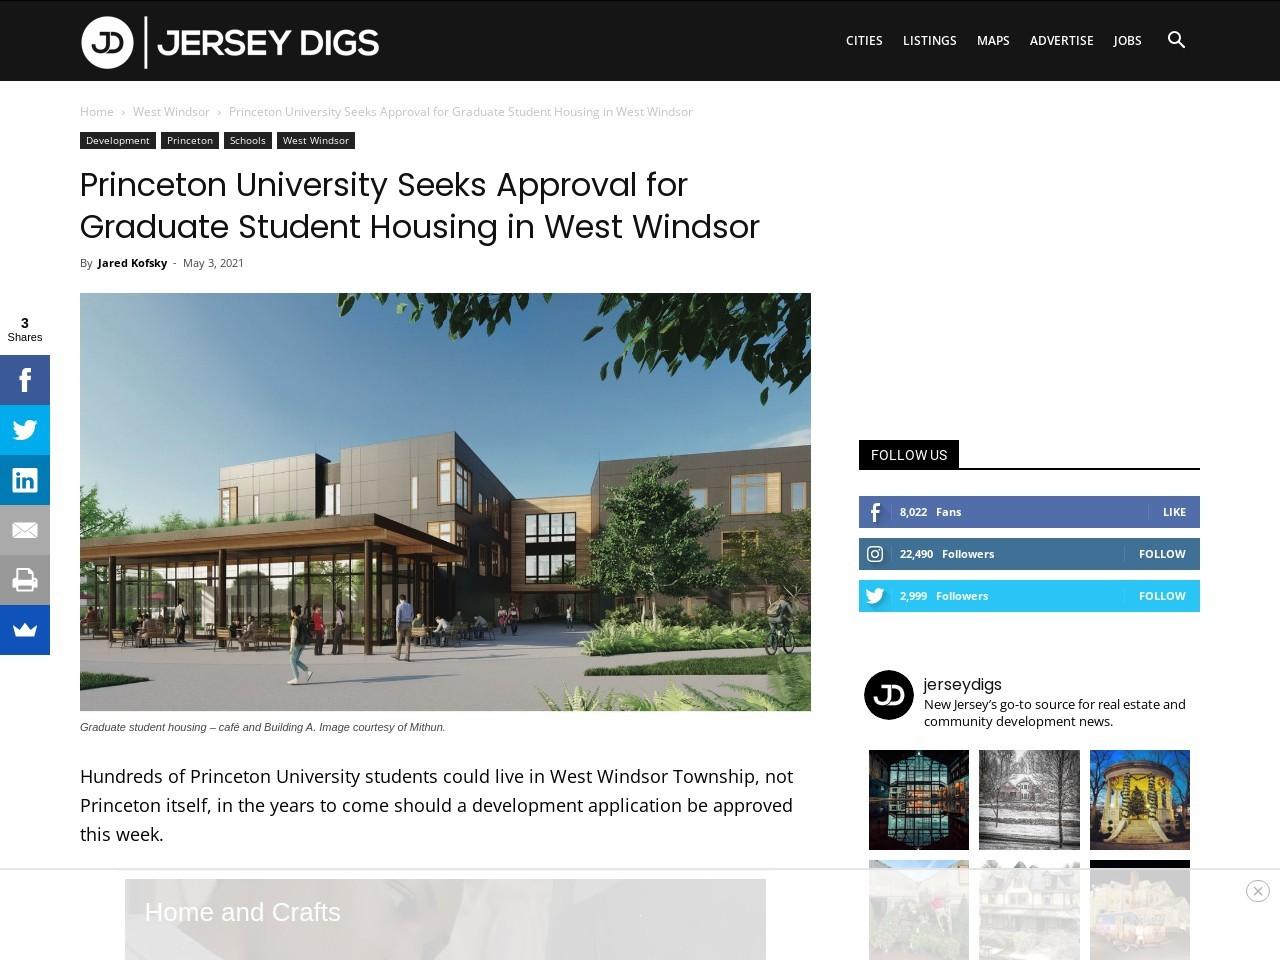 Princeton University Seeks Approval for Graduate Student Housing in West Windsor